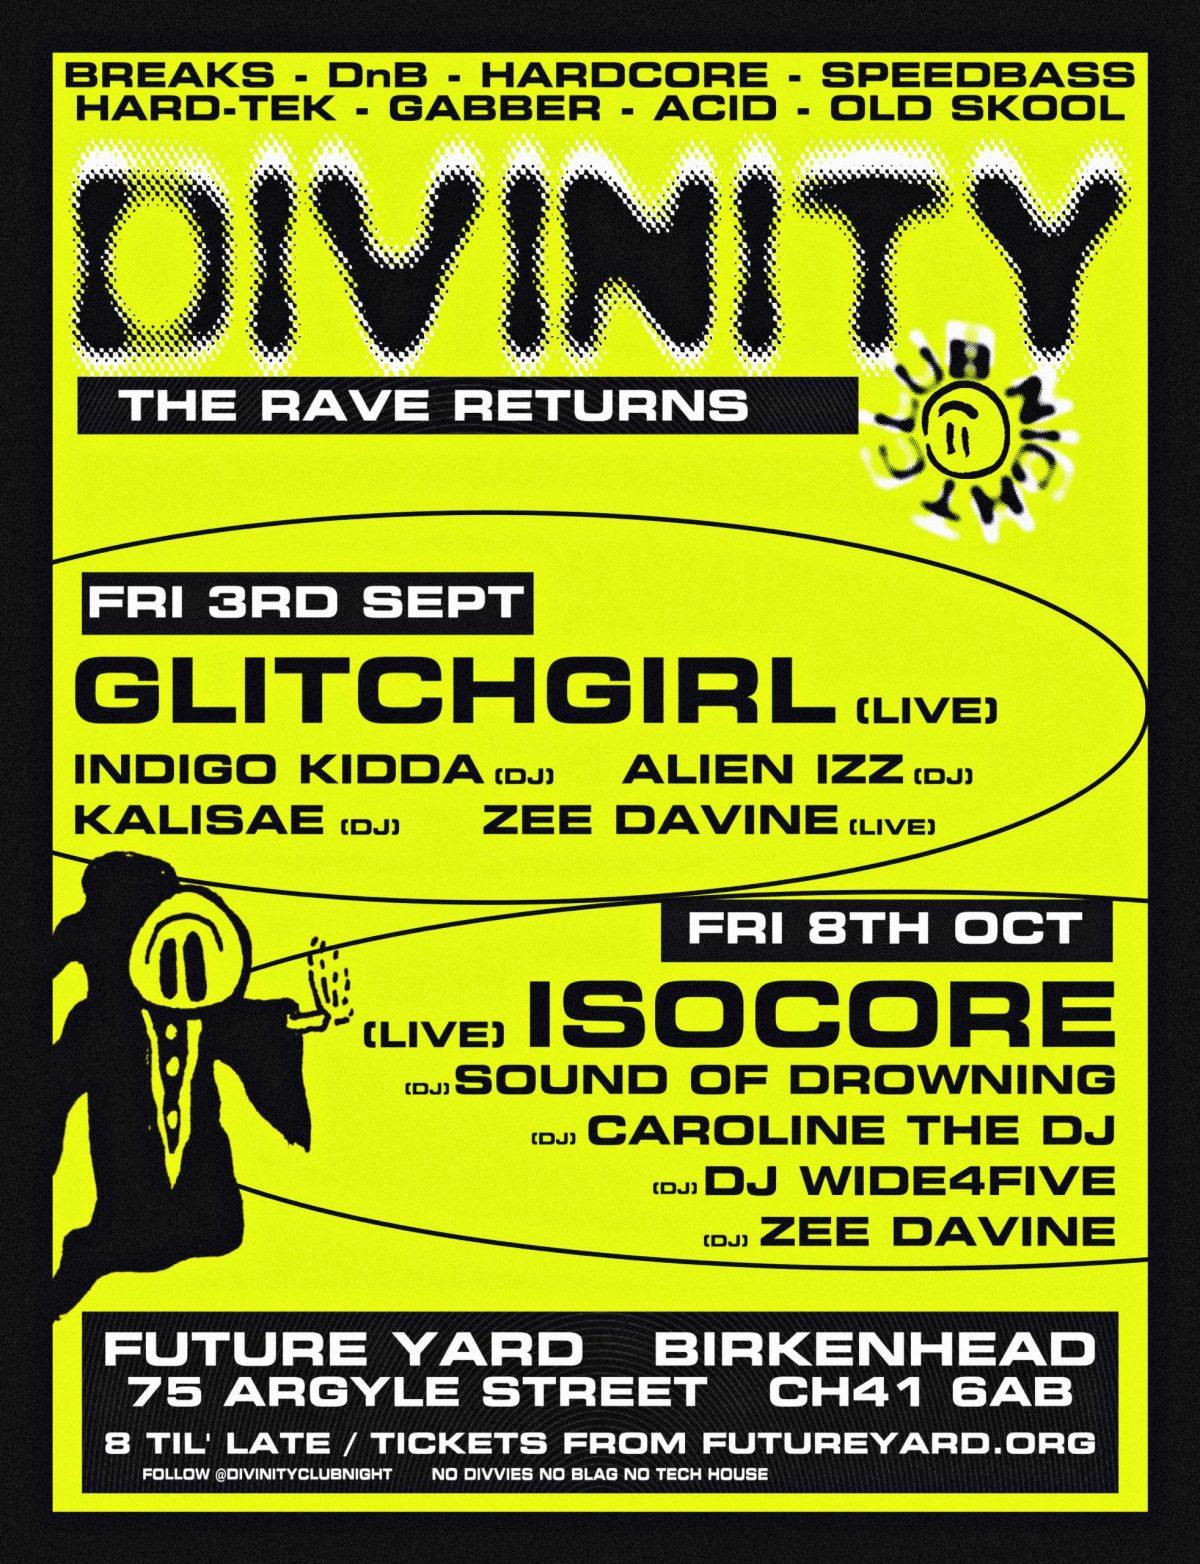 Divinity: Birkendread Edition